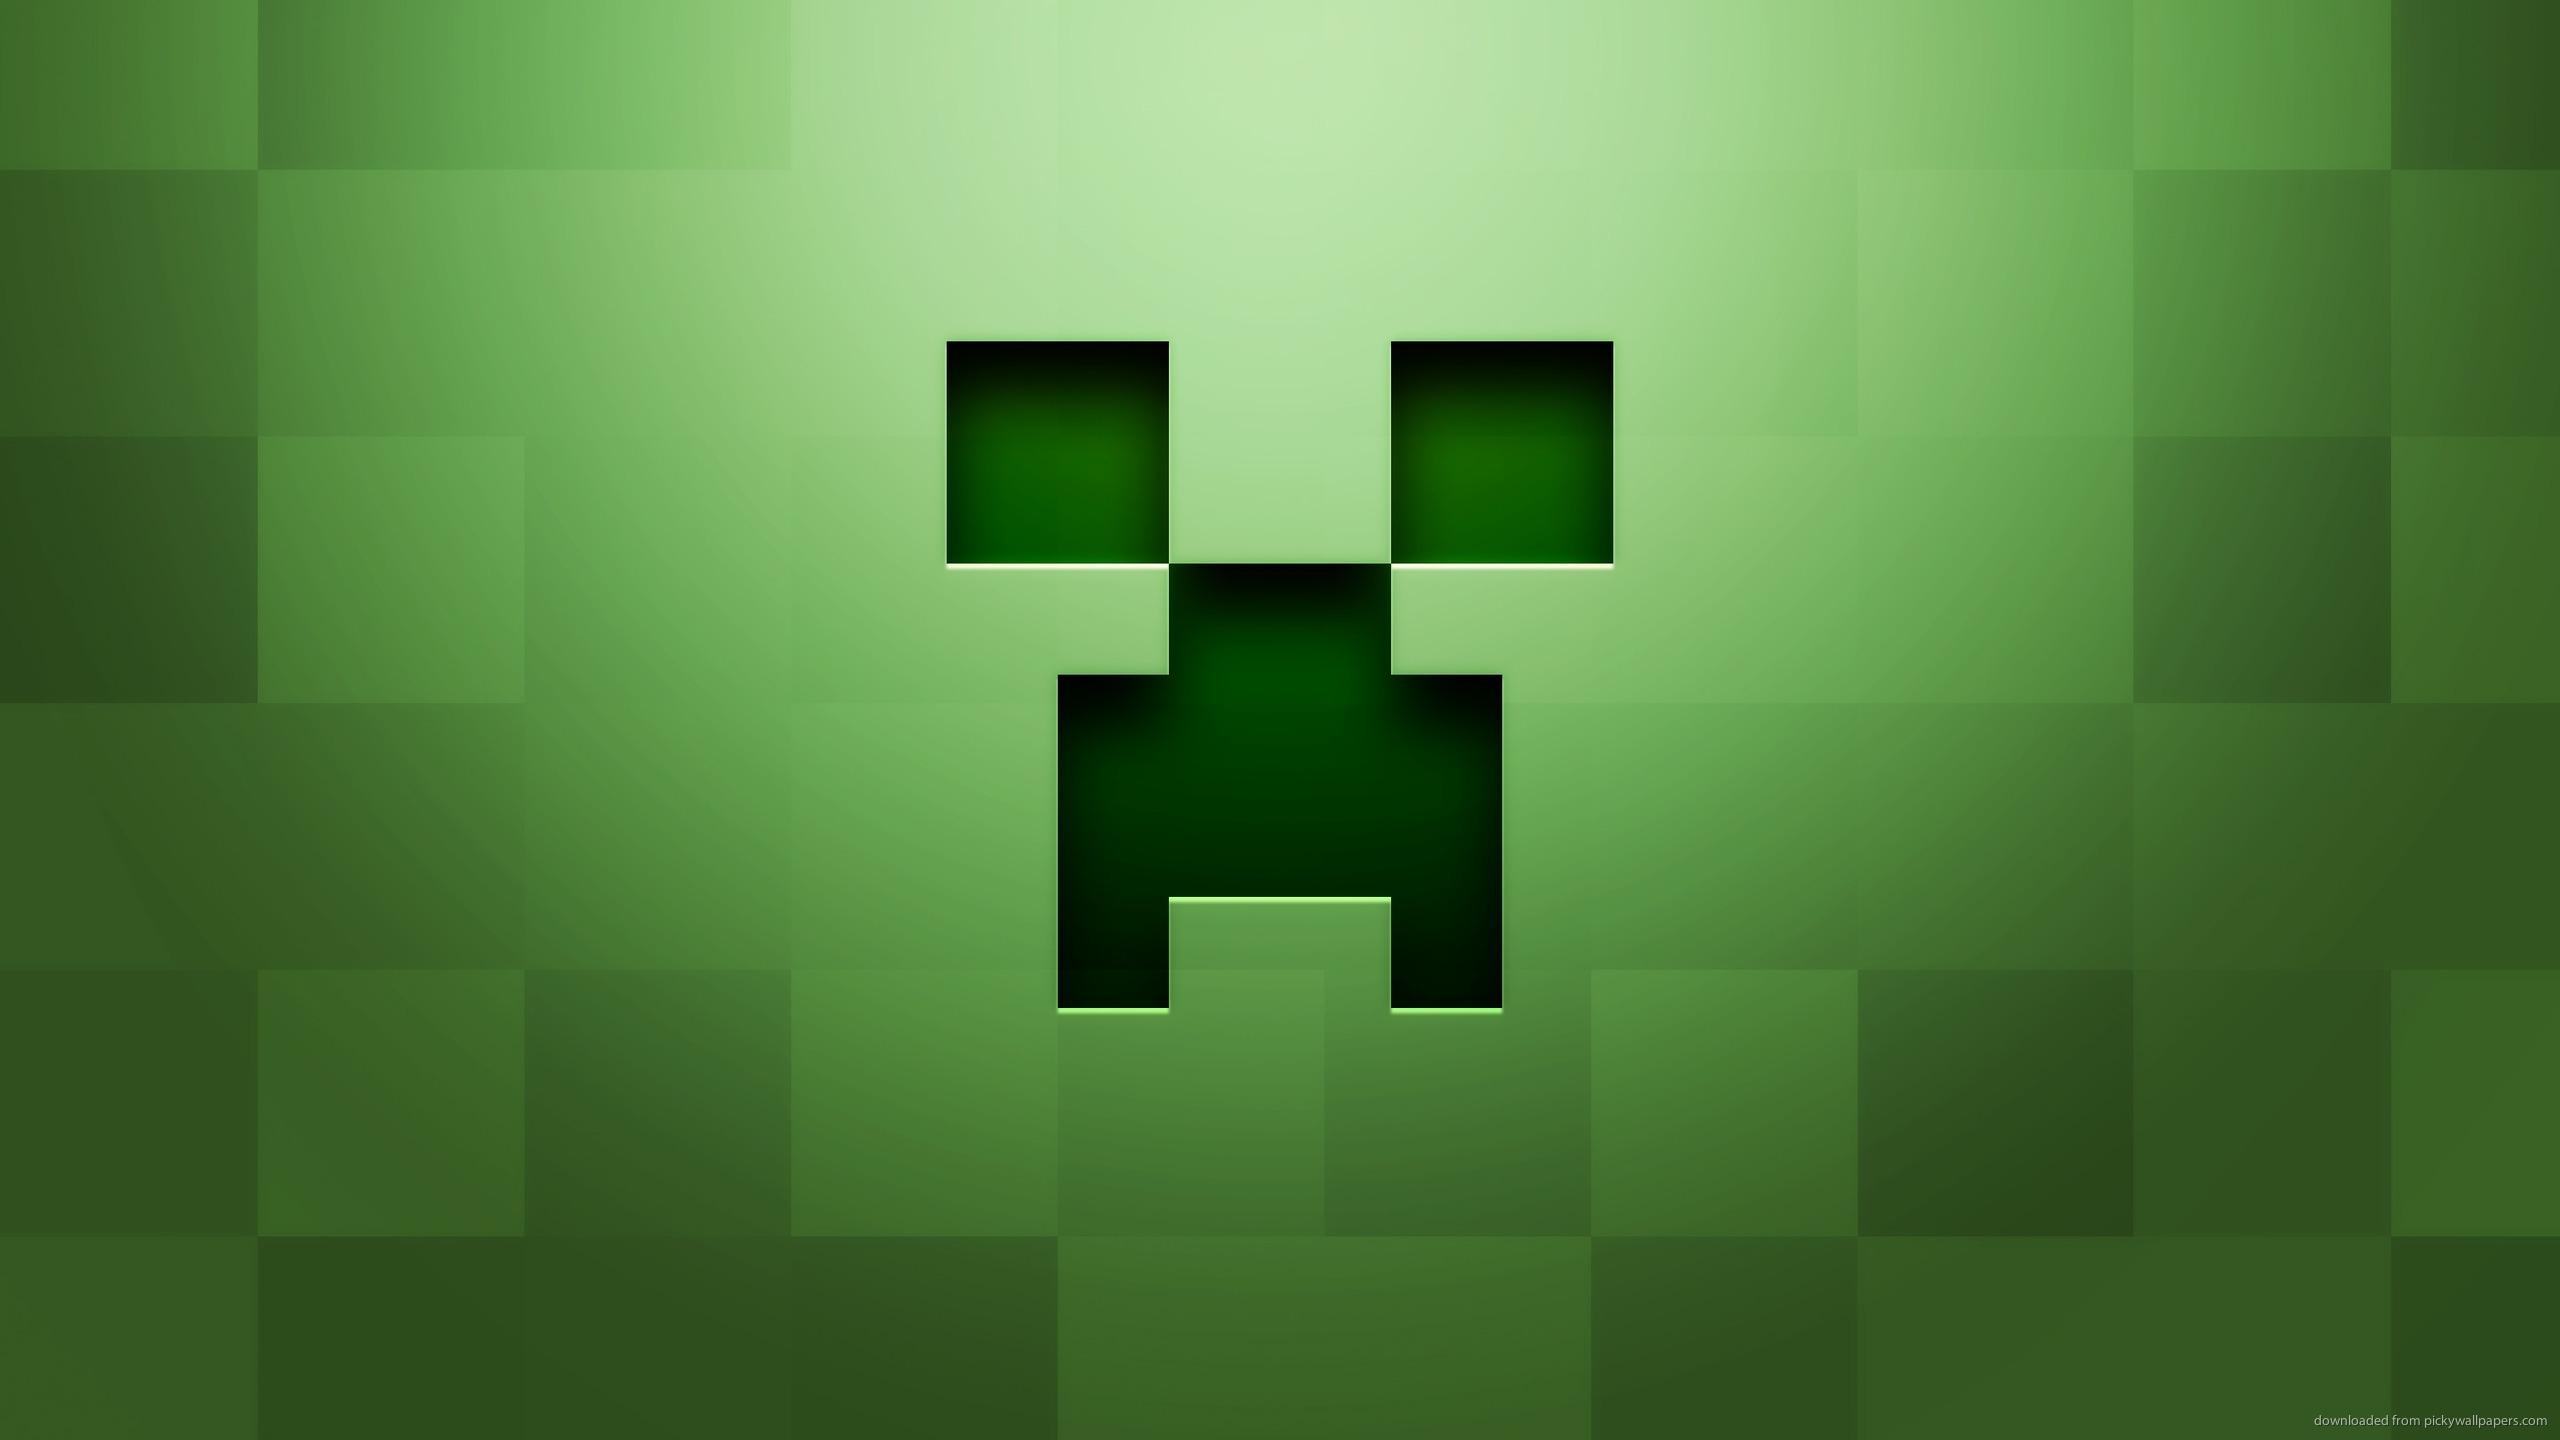 minecraft creeper wallpapers games wallpaper 2560x1440 2560x1440